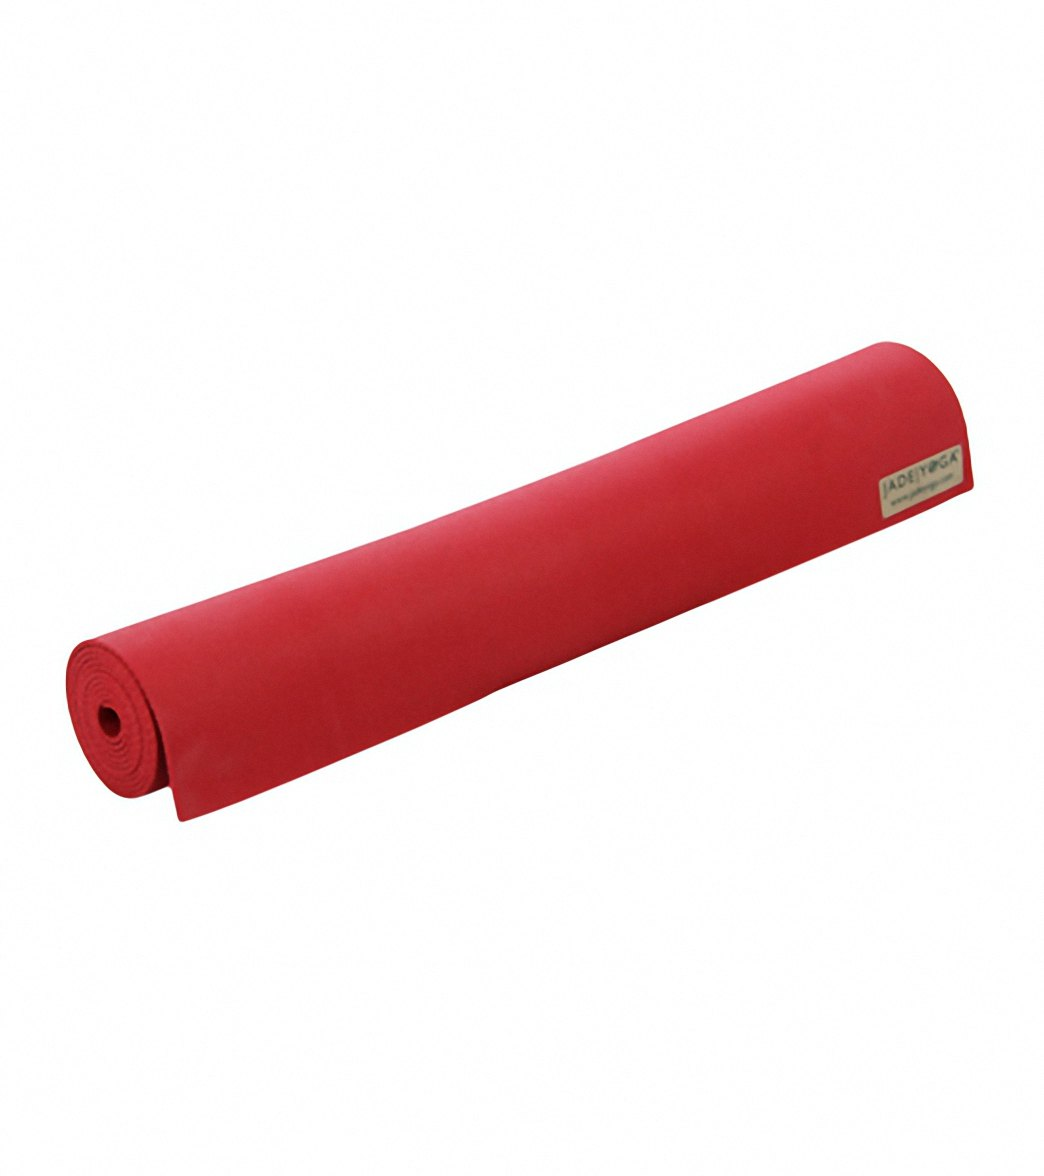 Jade Yoga Travel Long Natural Rubber Yoga Mat 74 Quot 3mm At